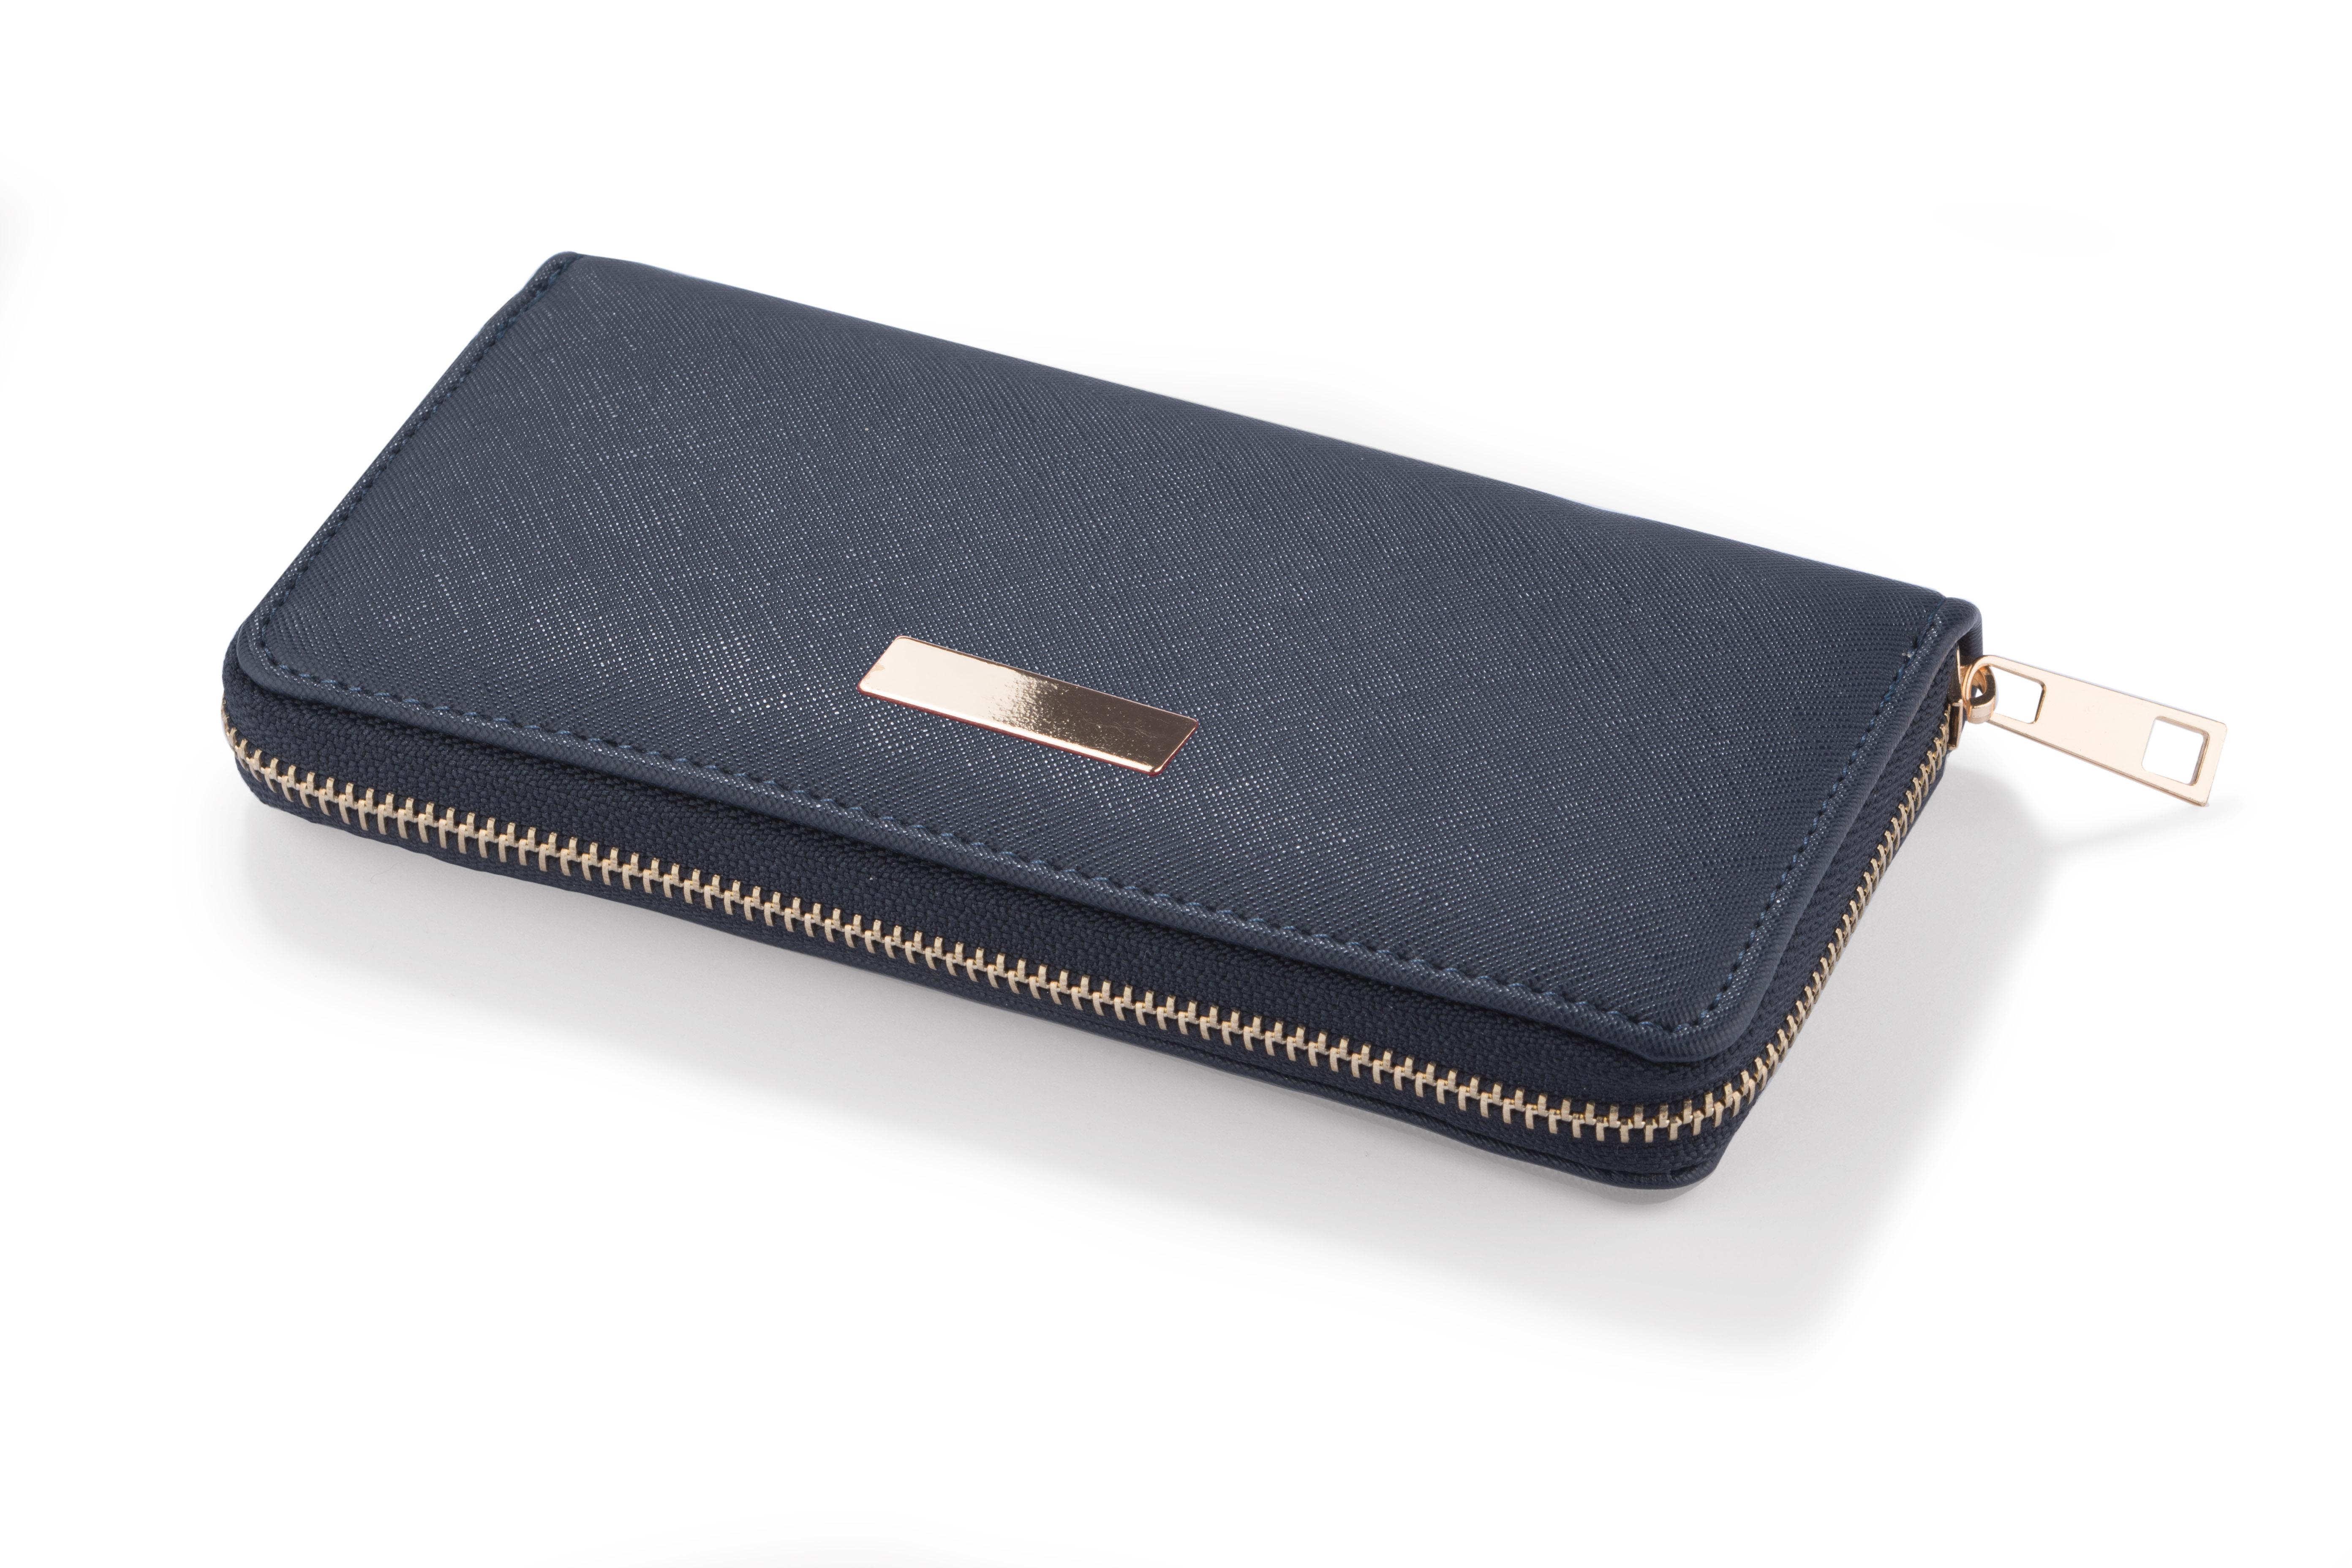 Wallet NESS - II quality